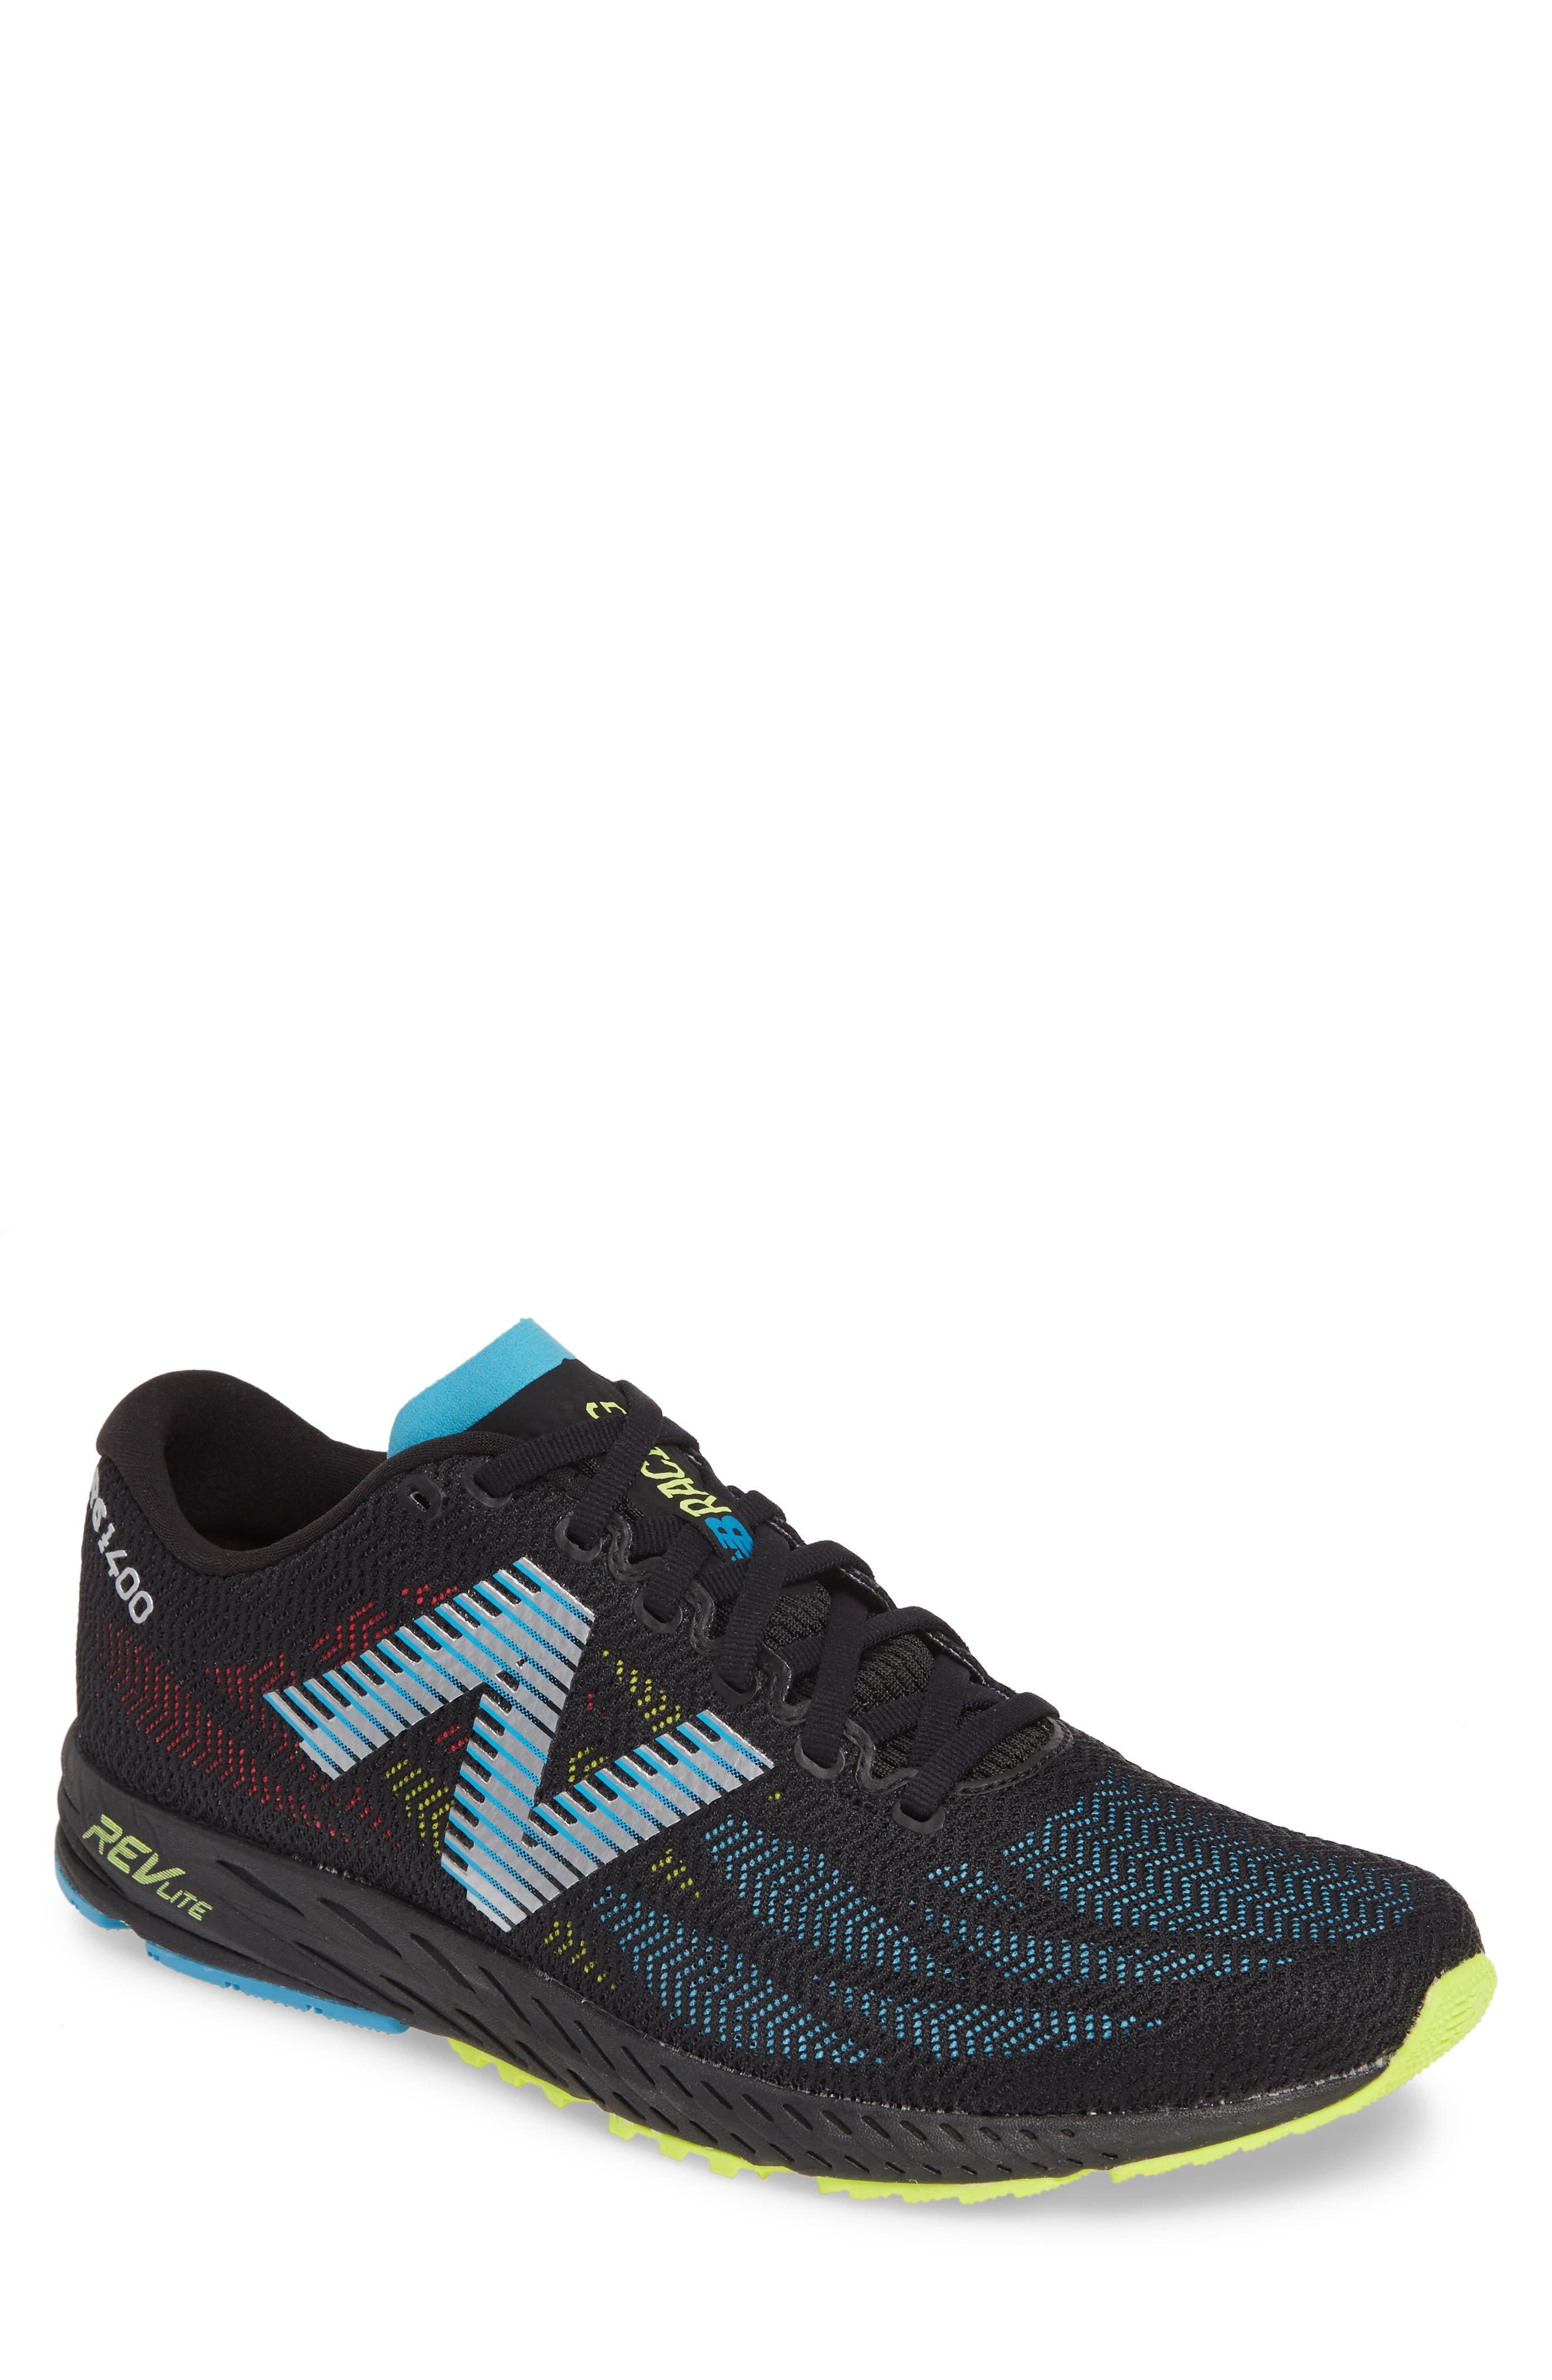 New Balance 1400V6 Running Shoe